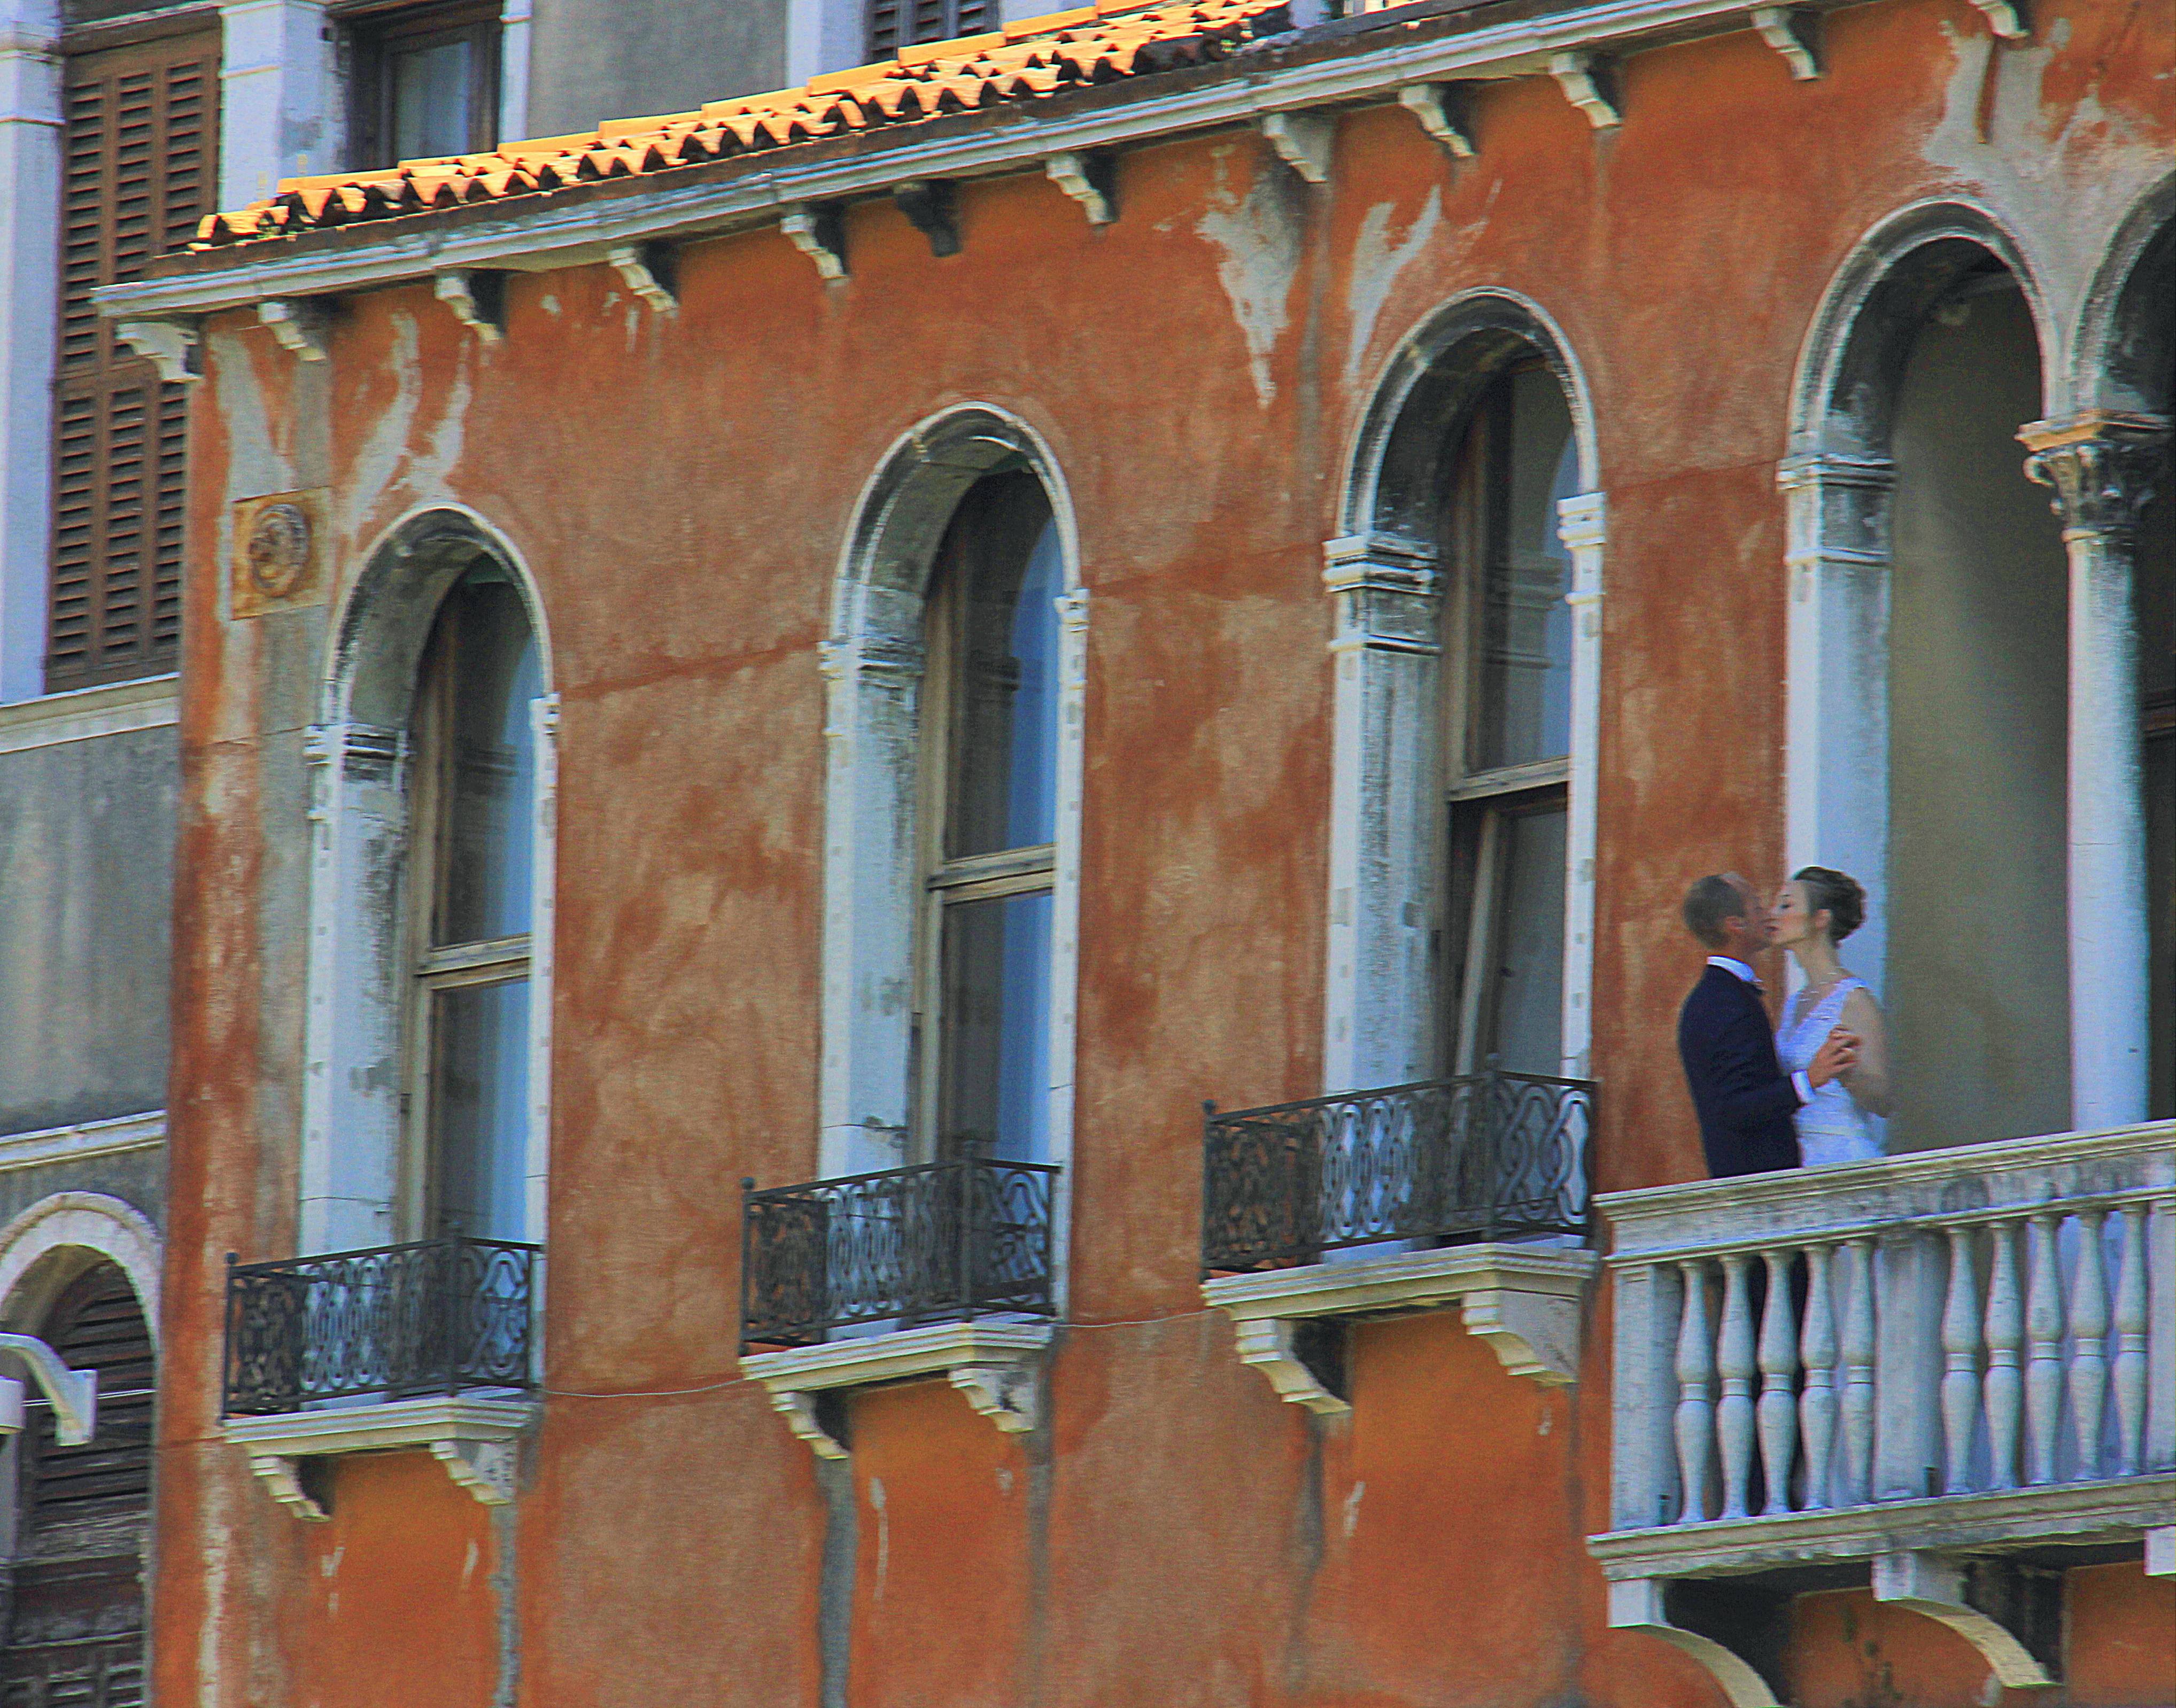 Destination wedding photo shoot in Venice